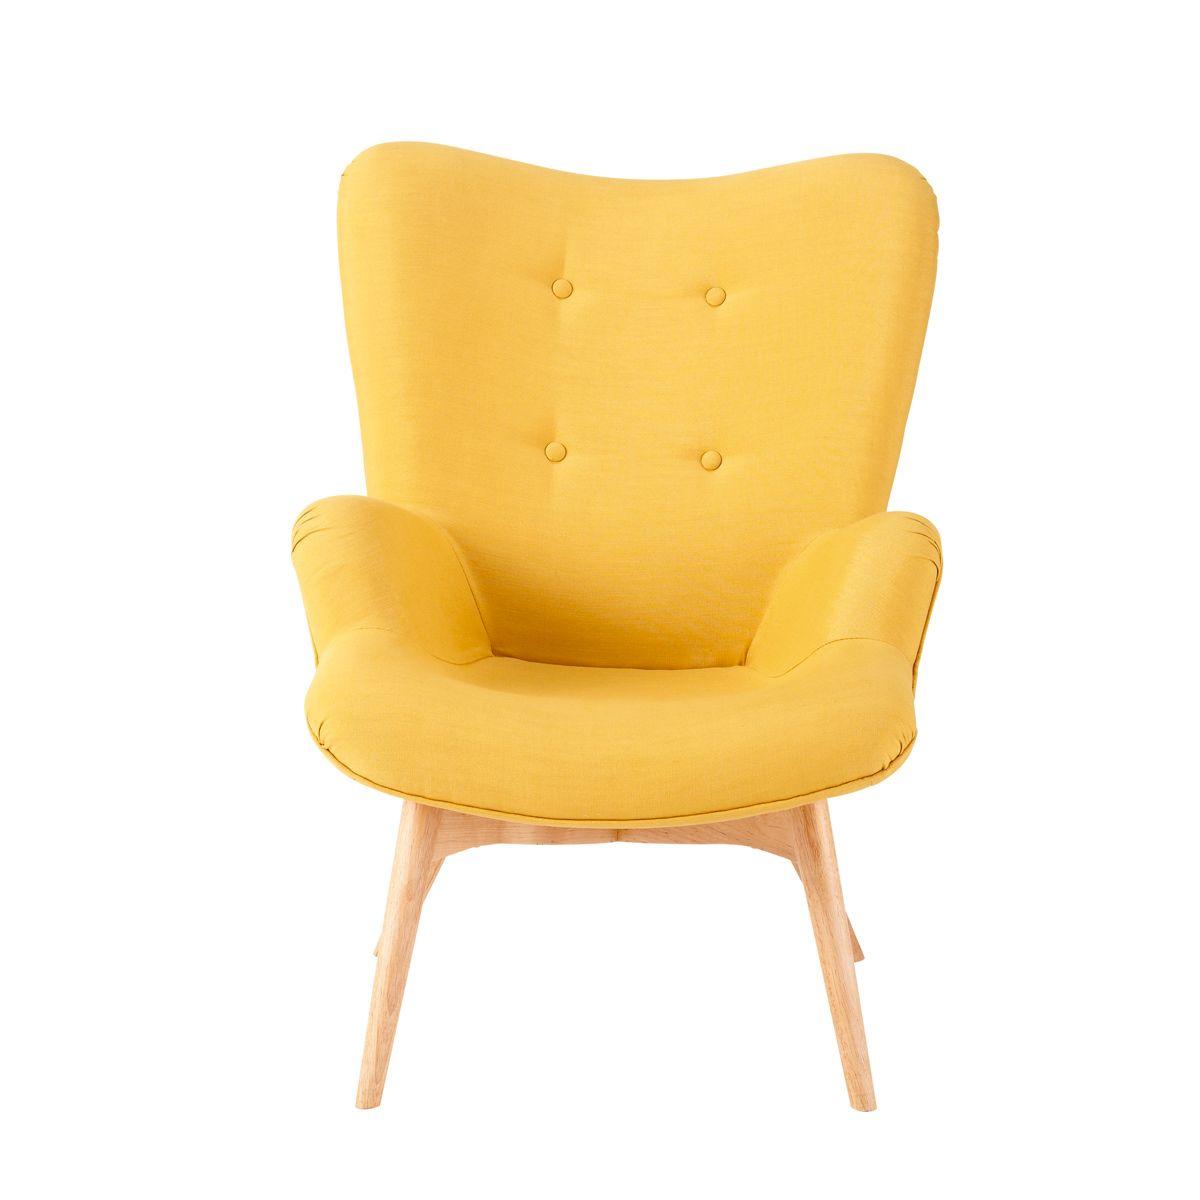 Fauteuil Scandinave En Jaune Salons Yellow Armchair And Armchairs - Fauteuil vintage moutarde